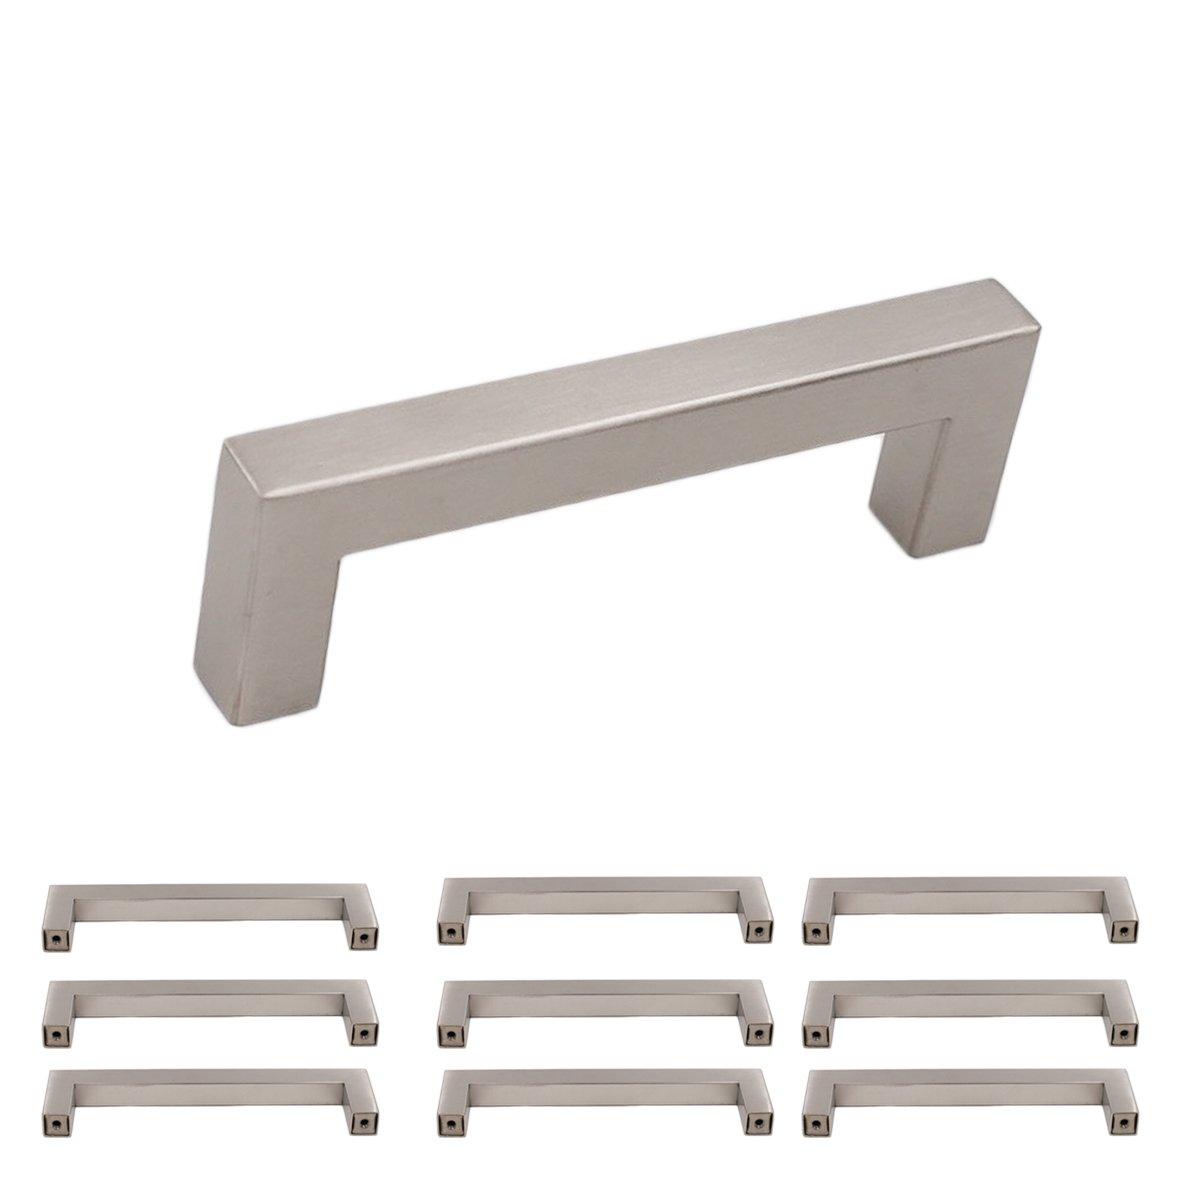 96mm Cabinet Handle 3 3/4 Cabinet Pulls Brushed Nickel 10 Pack - homdiy HDJ12SN Dresser Drawer Pulls Square Drawer Handles Modern Cabinet Hardware Kitchen Cabinet Handles Stainless Steel